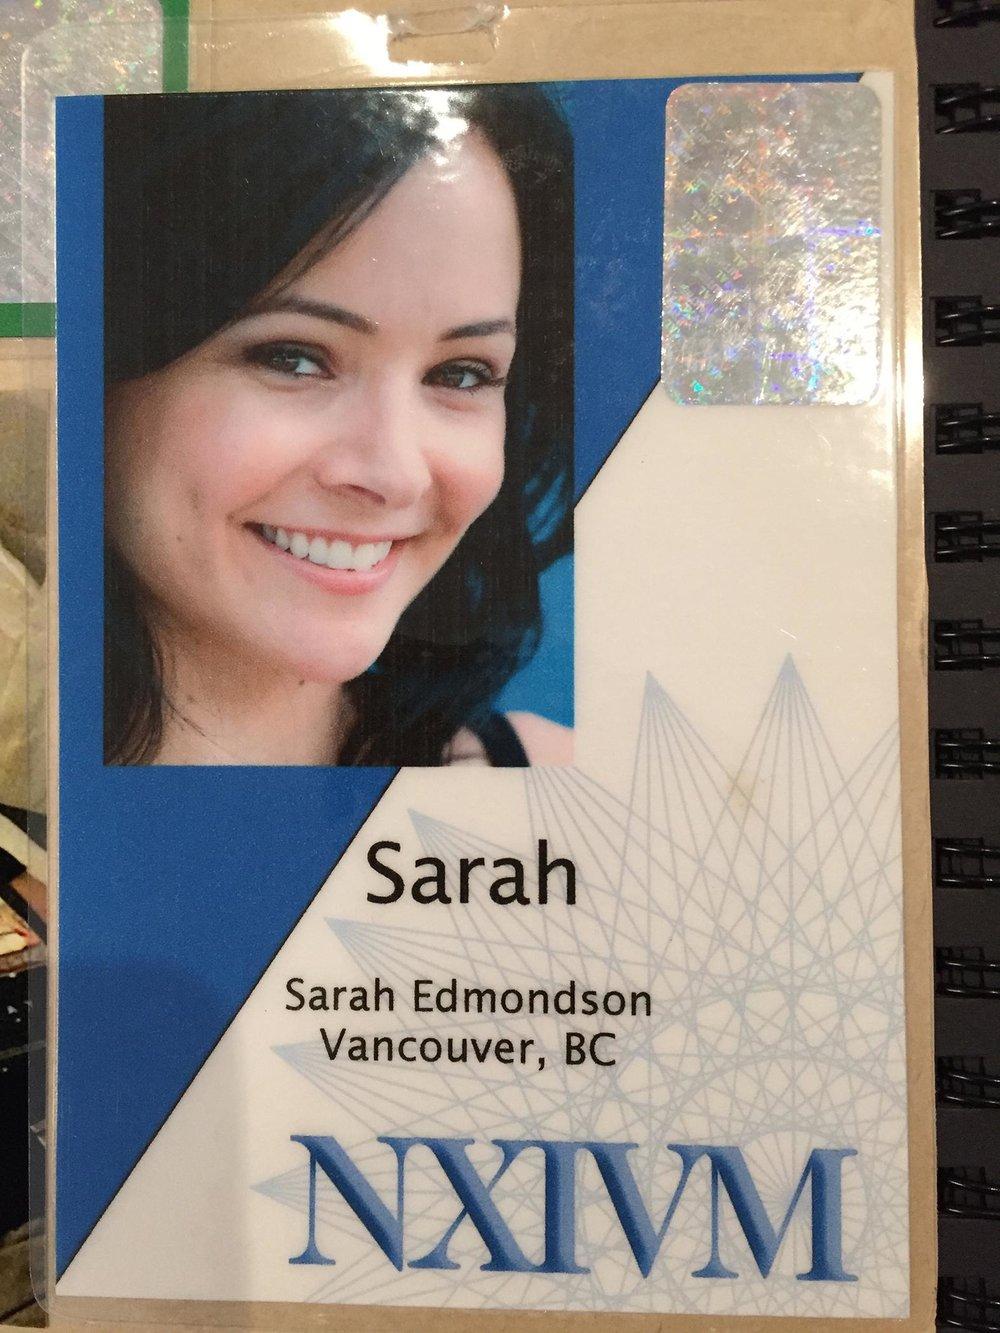 Sarah Edmondson's Name Badge.